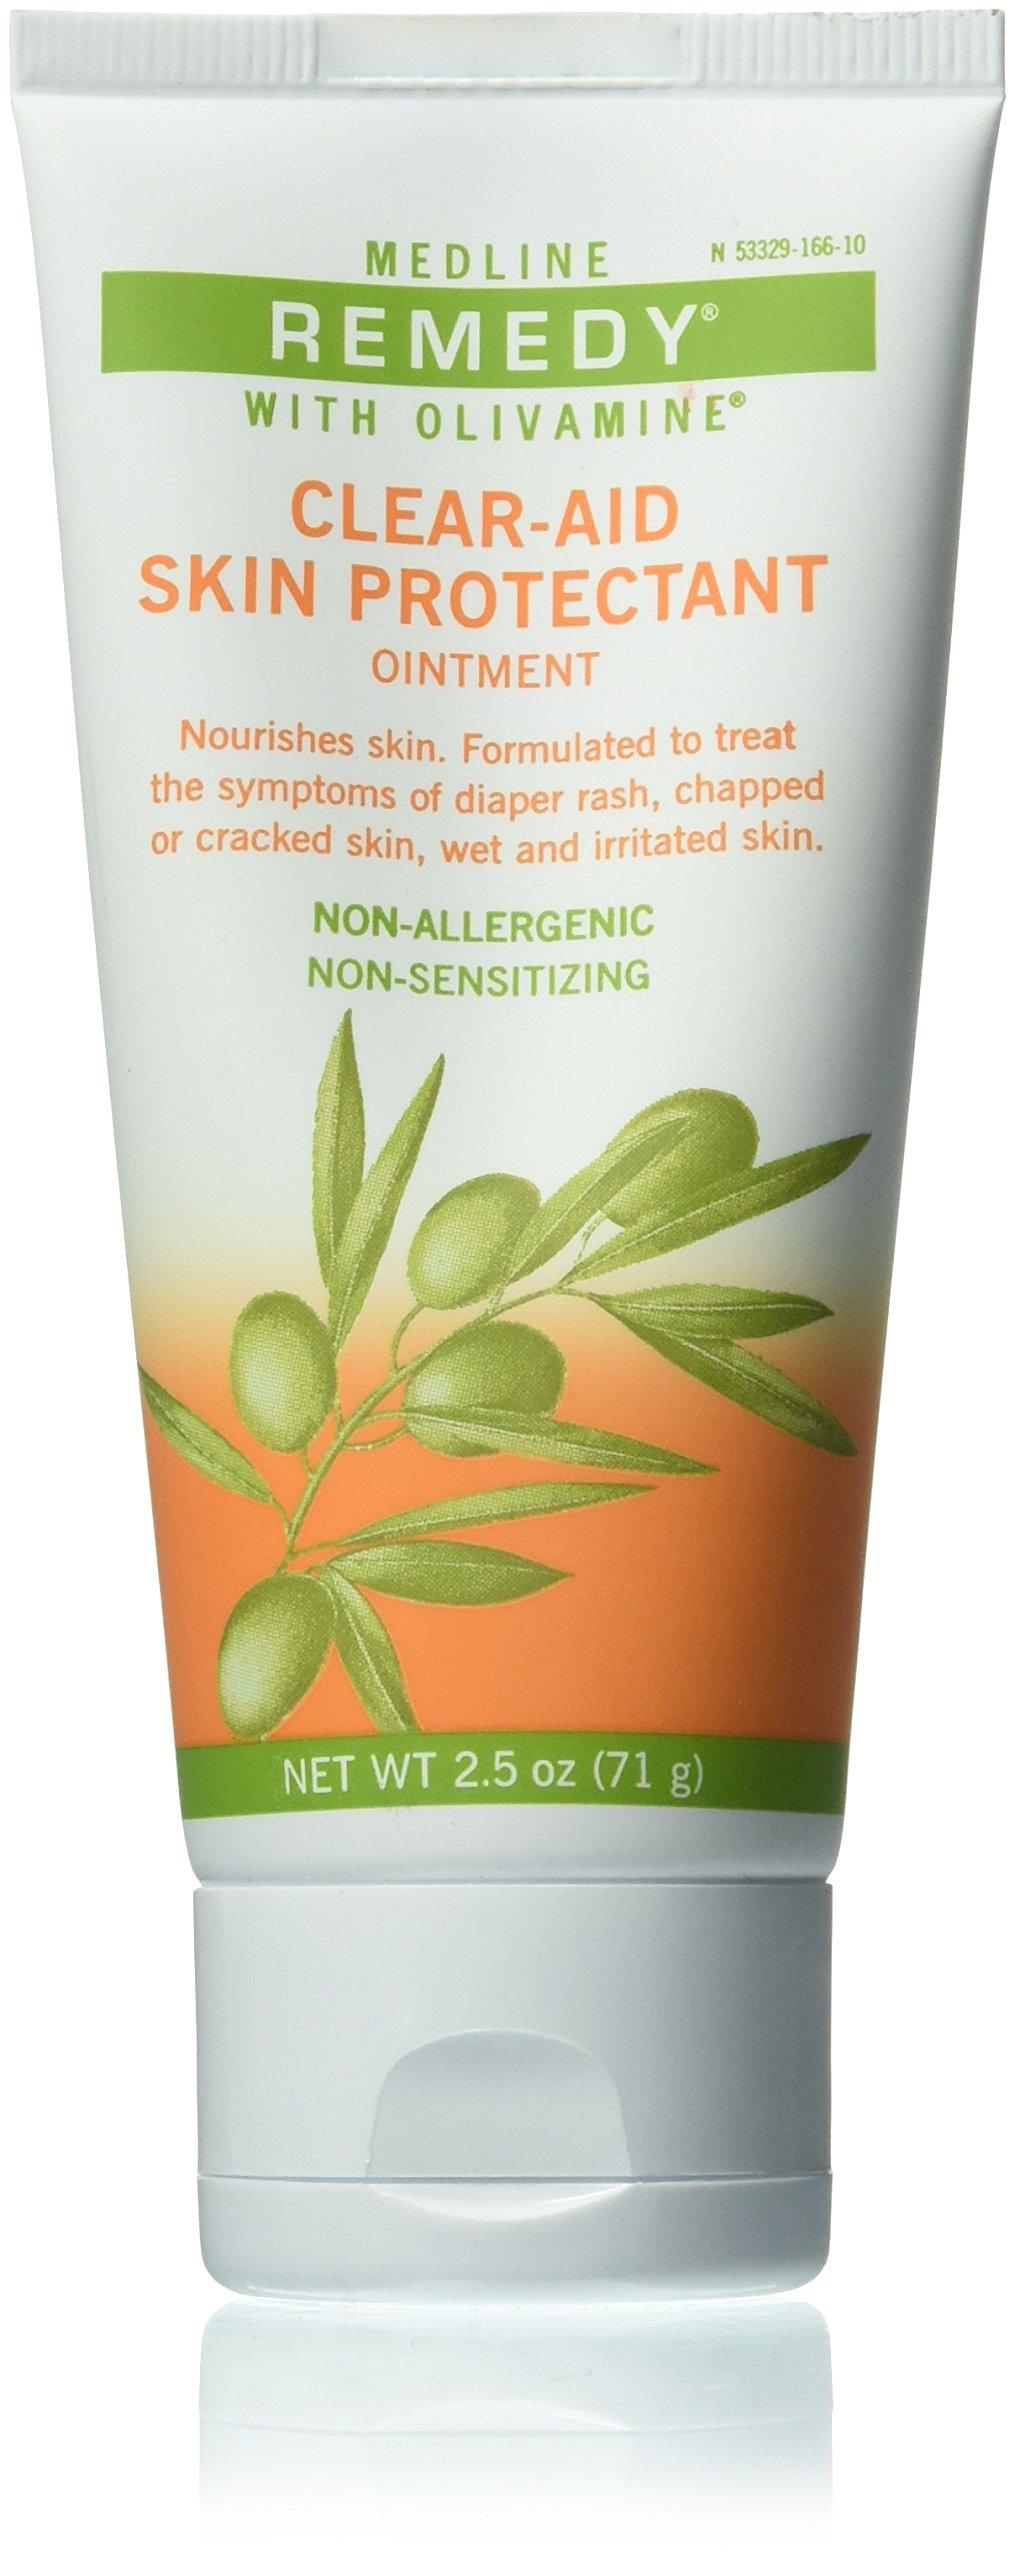 Medline Remedy Olivamine Clear-aid Skin Protectant, 2.5 Ounce